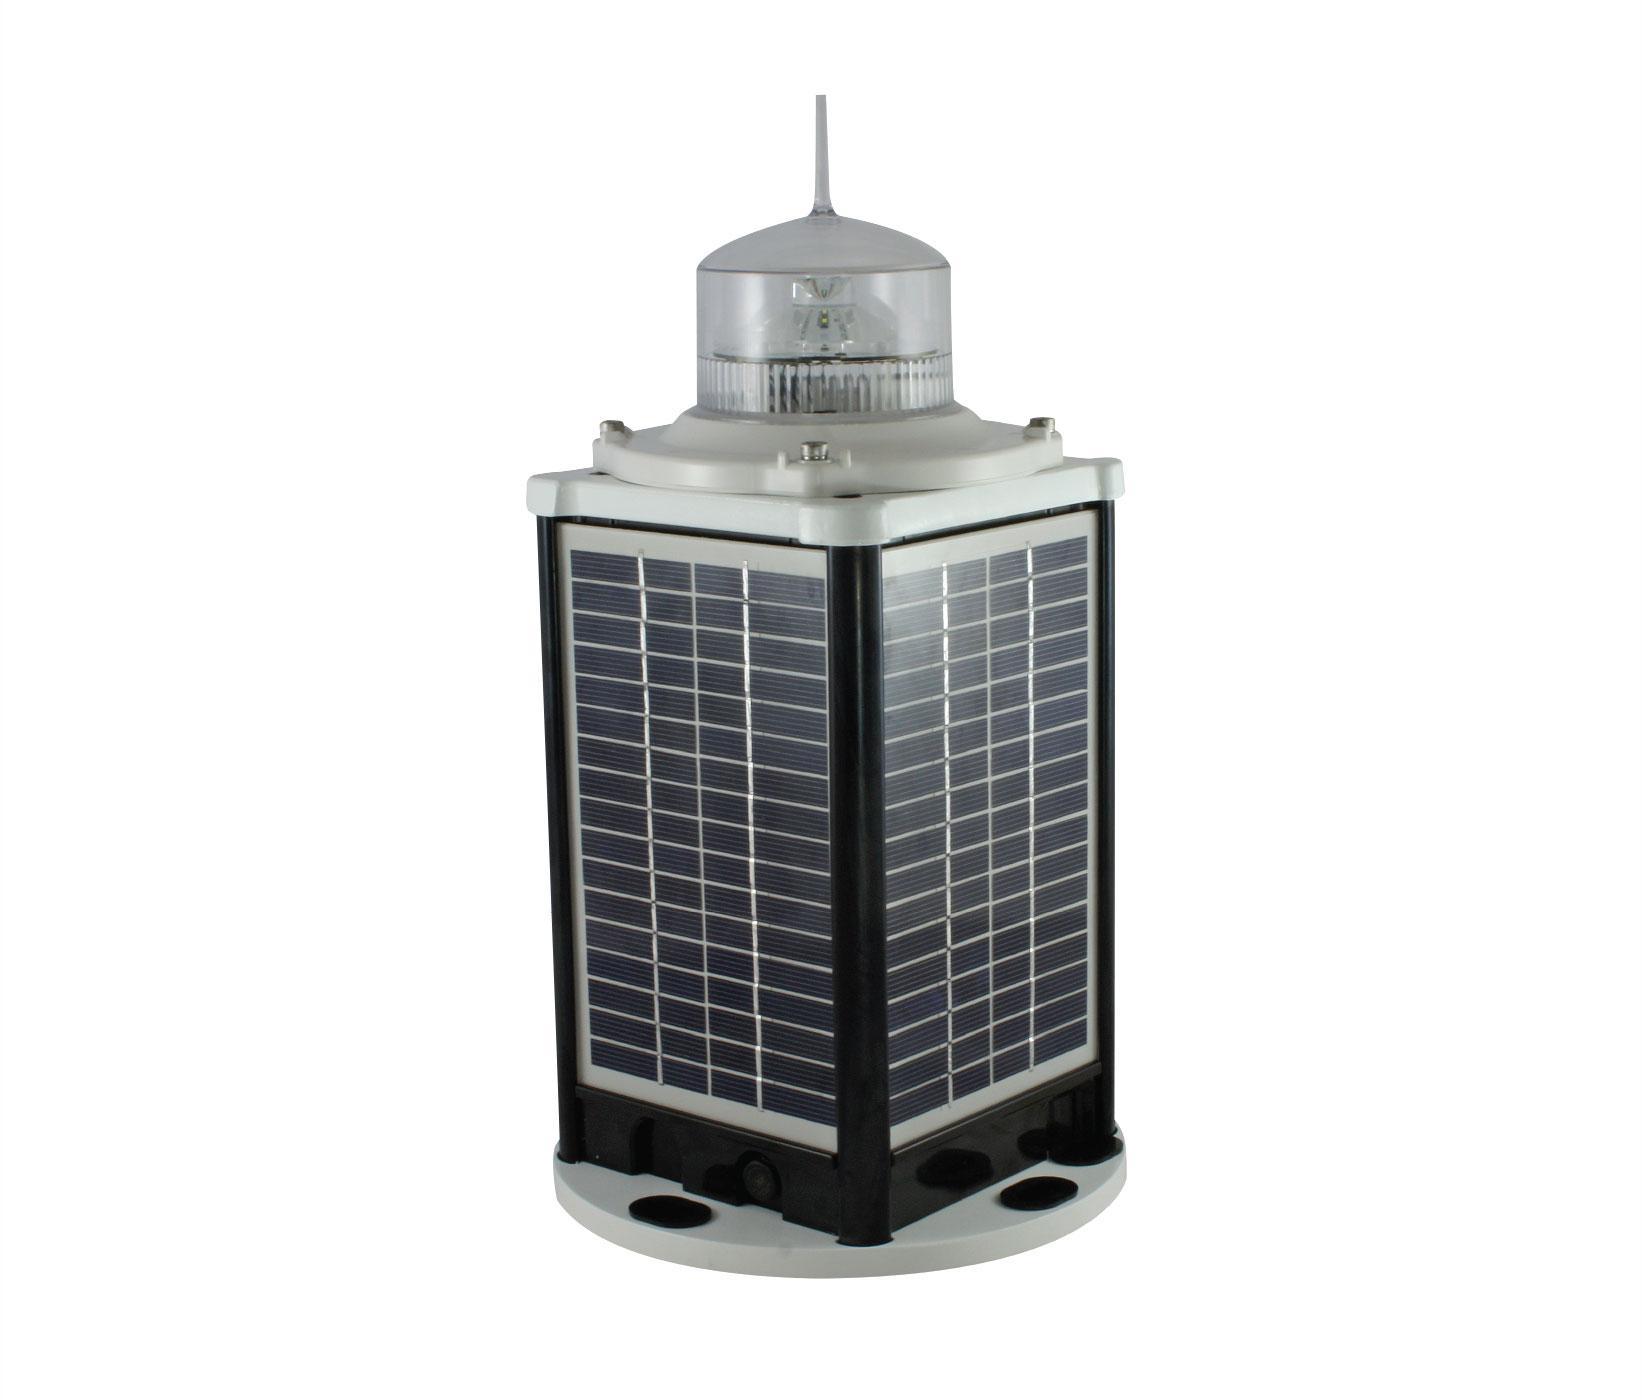 Class 'B' & 'C' Solar Lantern